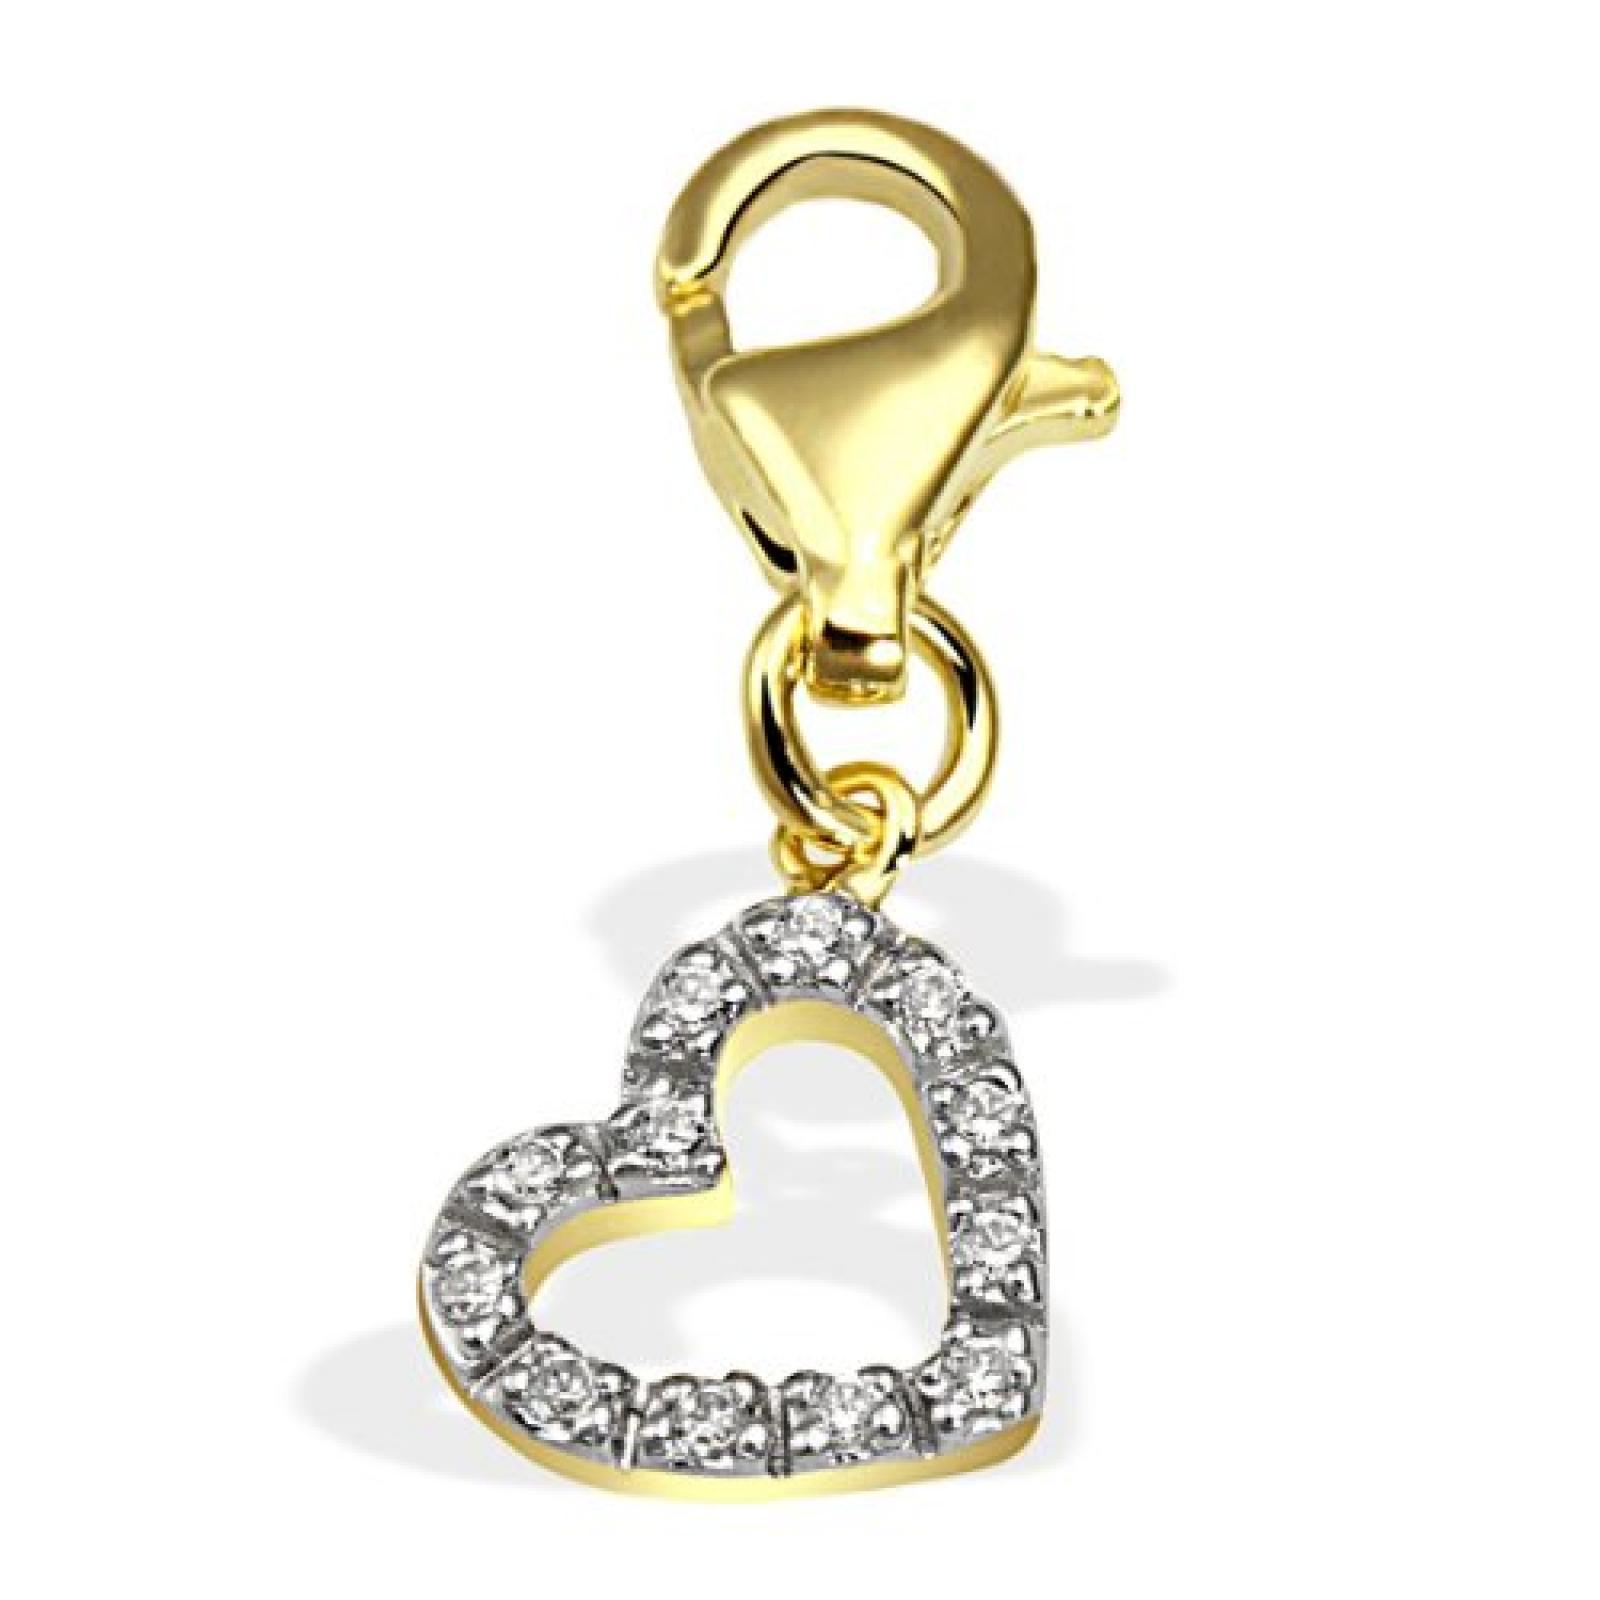 Goldmaid Damen-Charm Herz 333 Gelbgold 12 Zirkonia Gch A4416GG